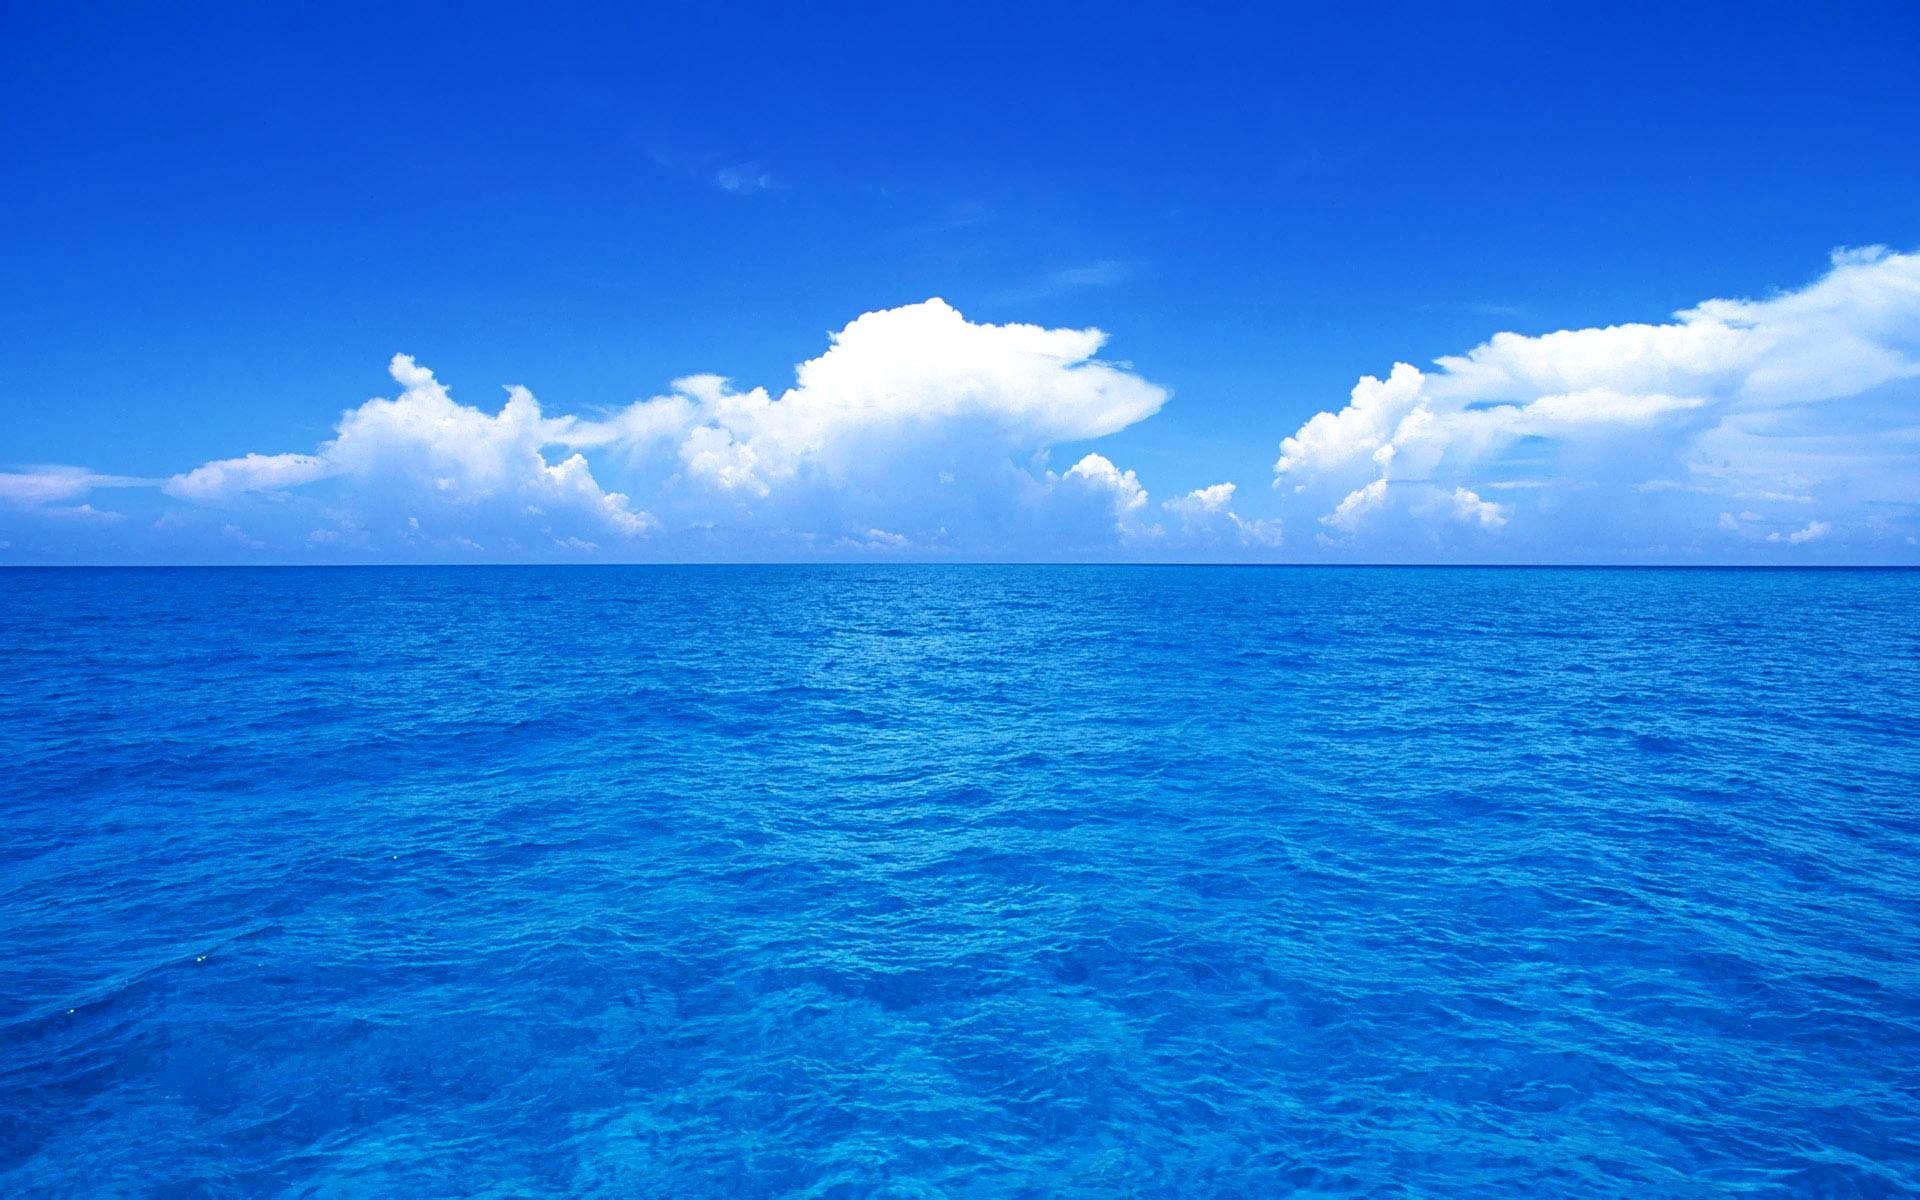 Pics Photos - Dynamic Ocean Scenes Desktop Wallpaper